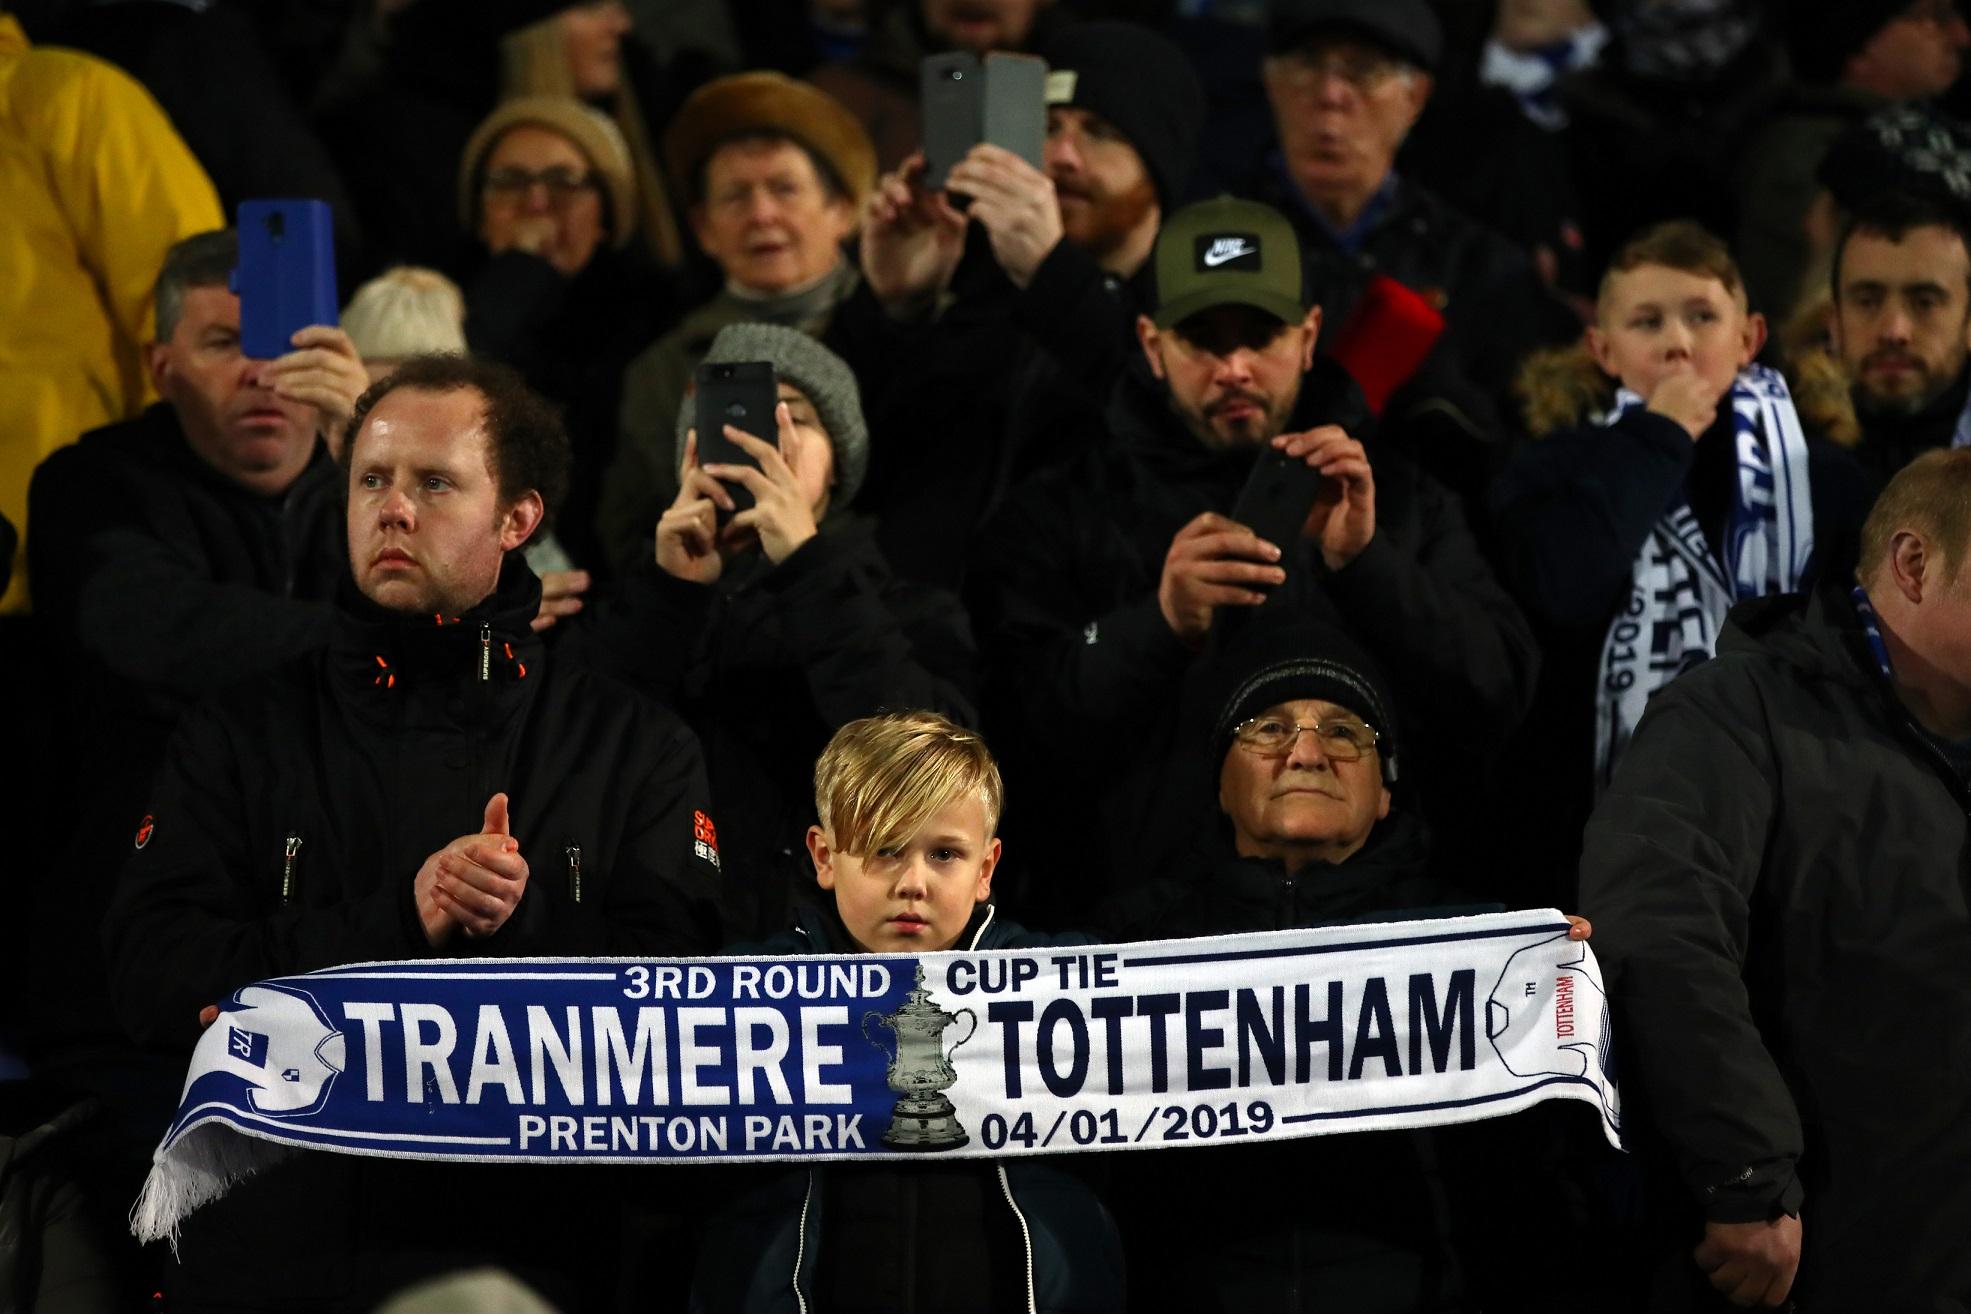 Tranmere-Tottenham